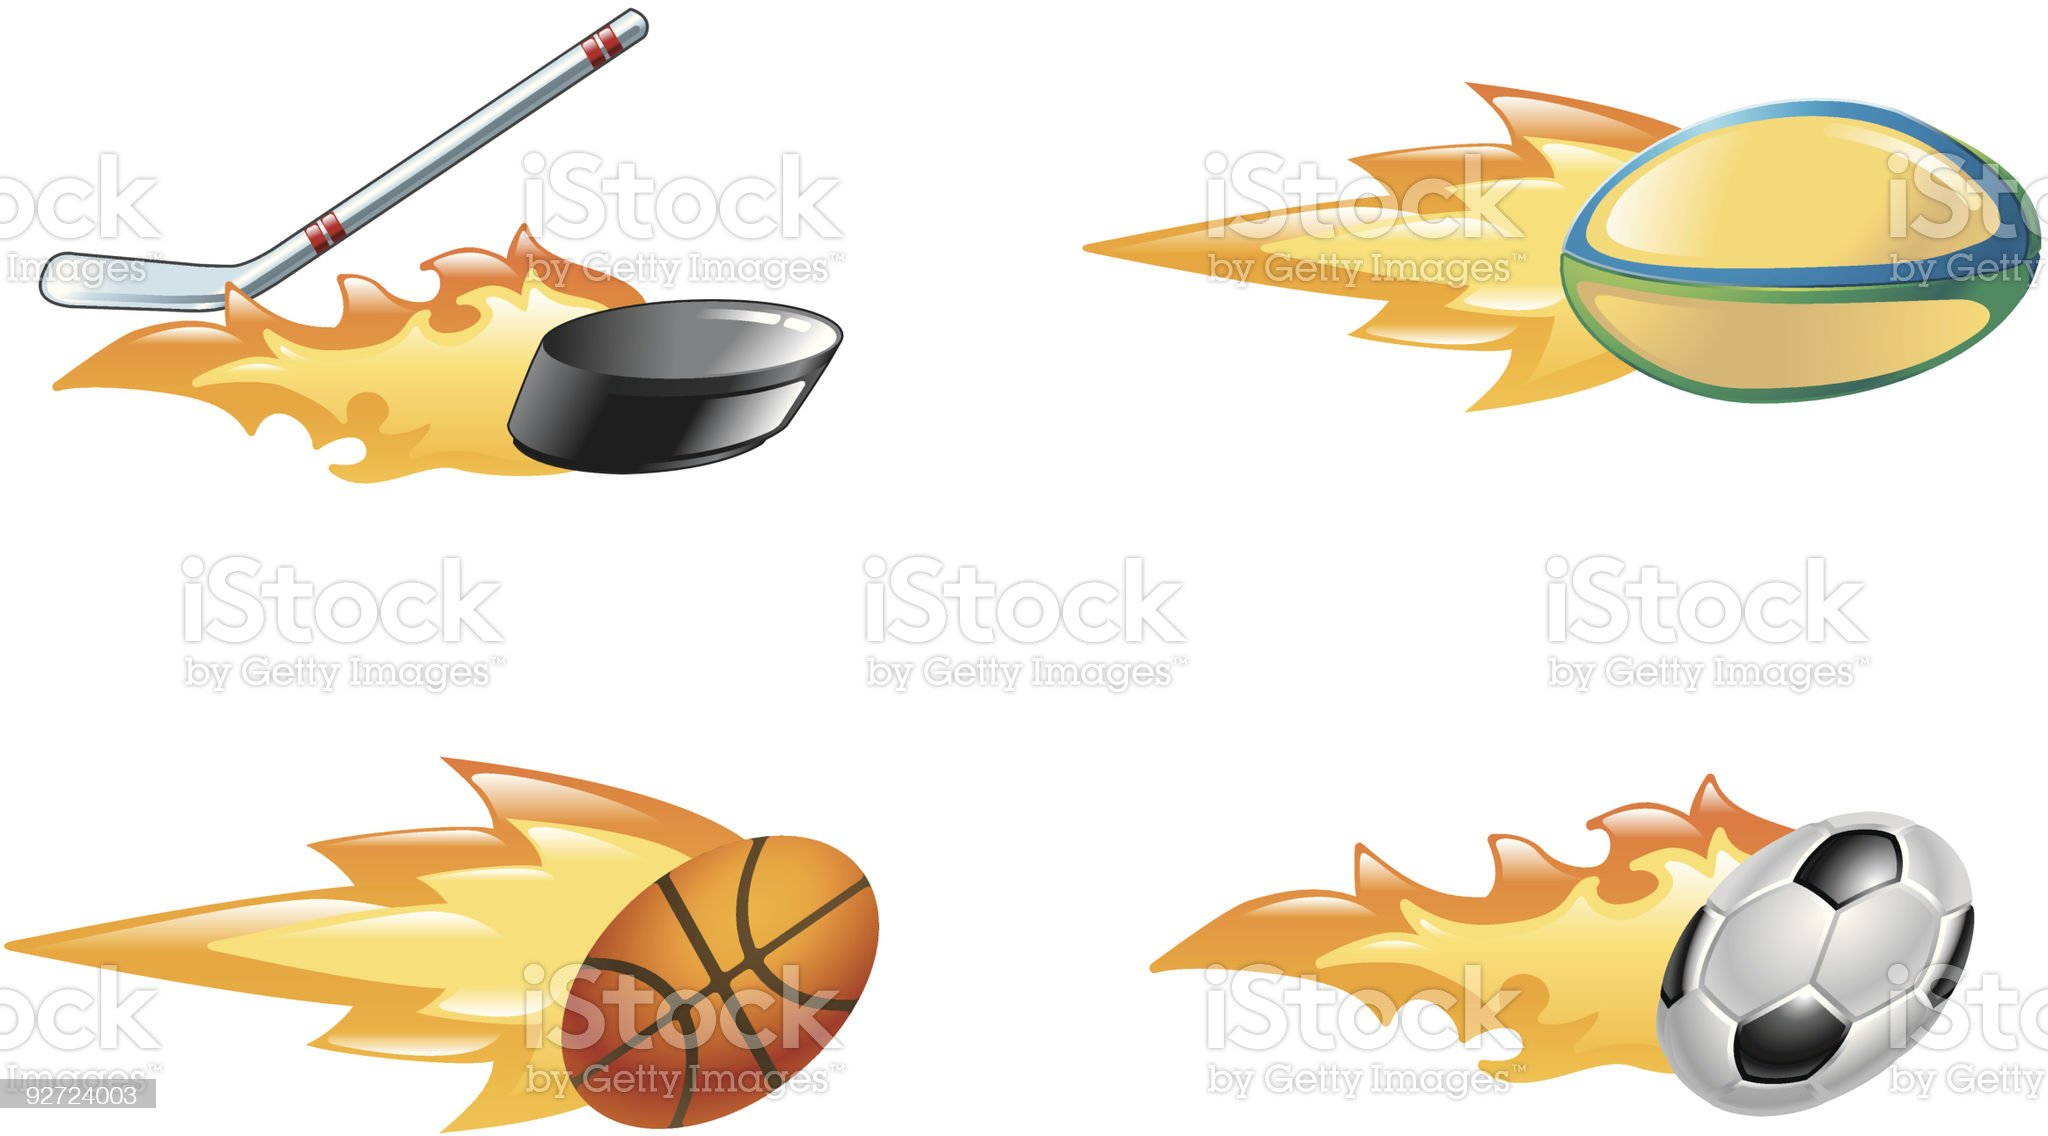 Shiny flaming sport icons royalty-free stock vector art